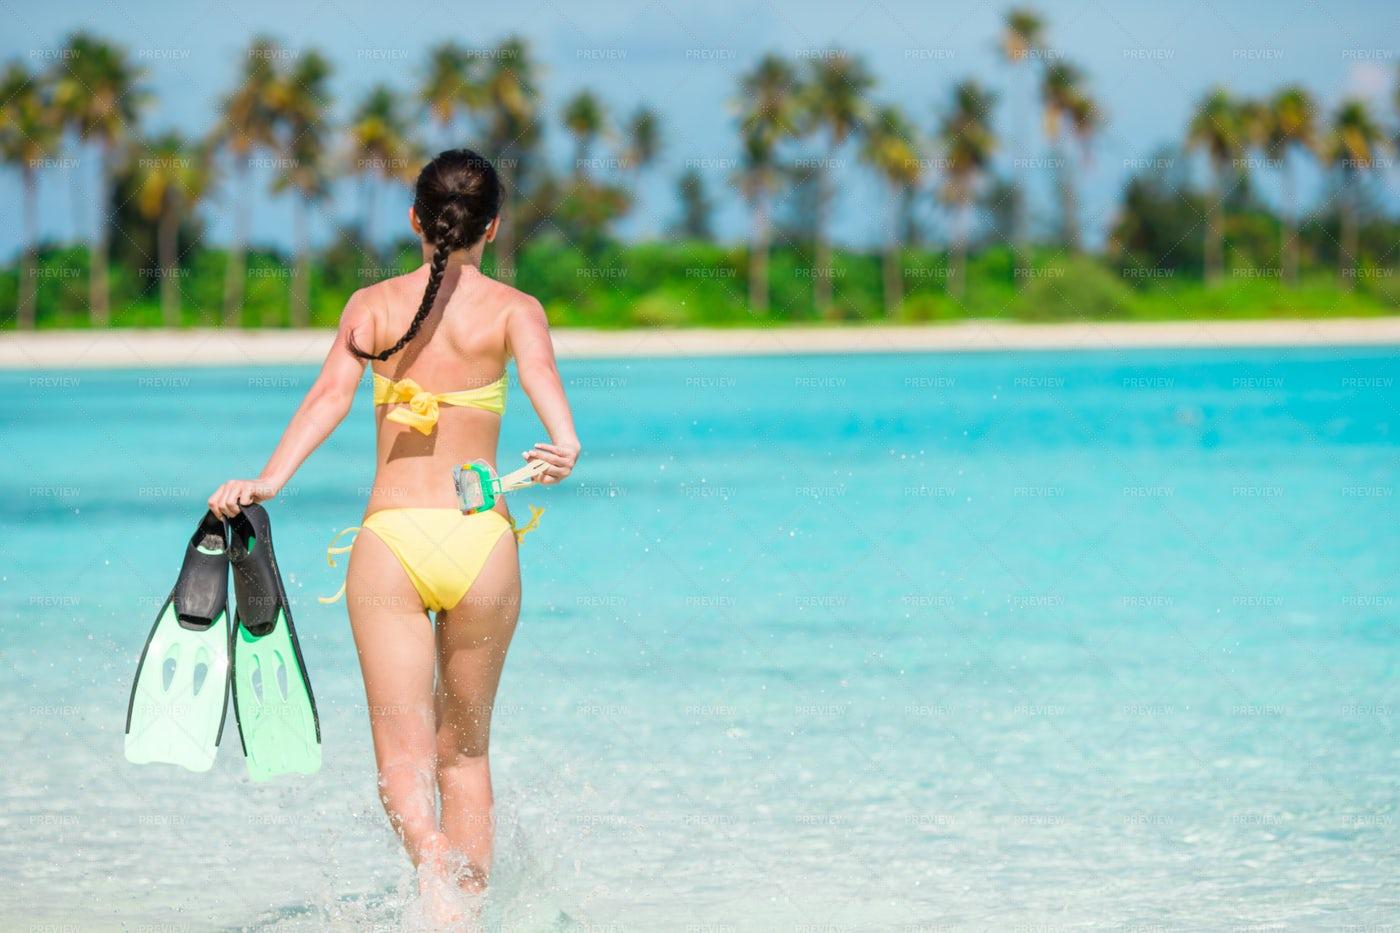 Girl With Snorkel Equipment: Stock Photos